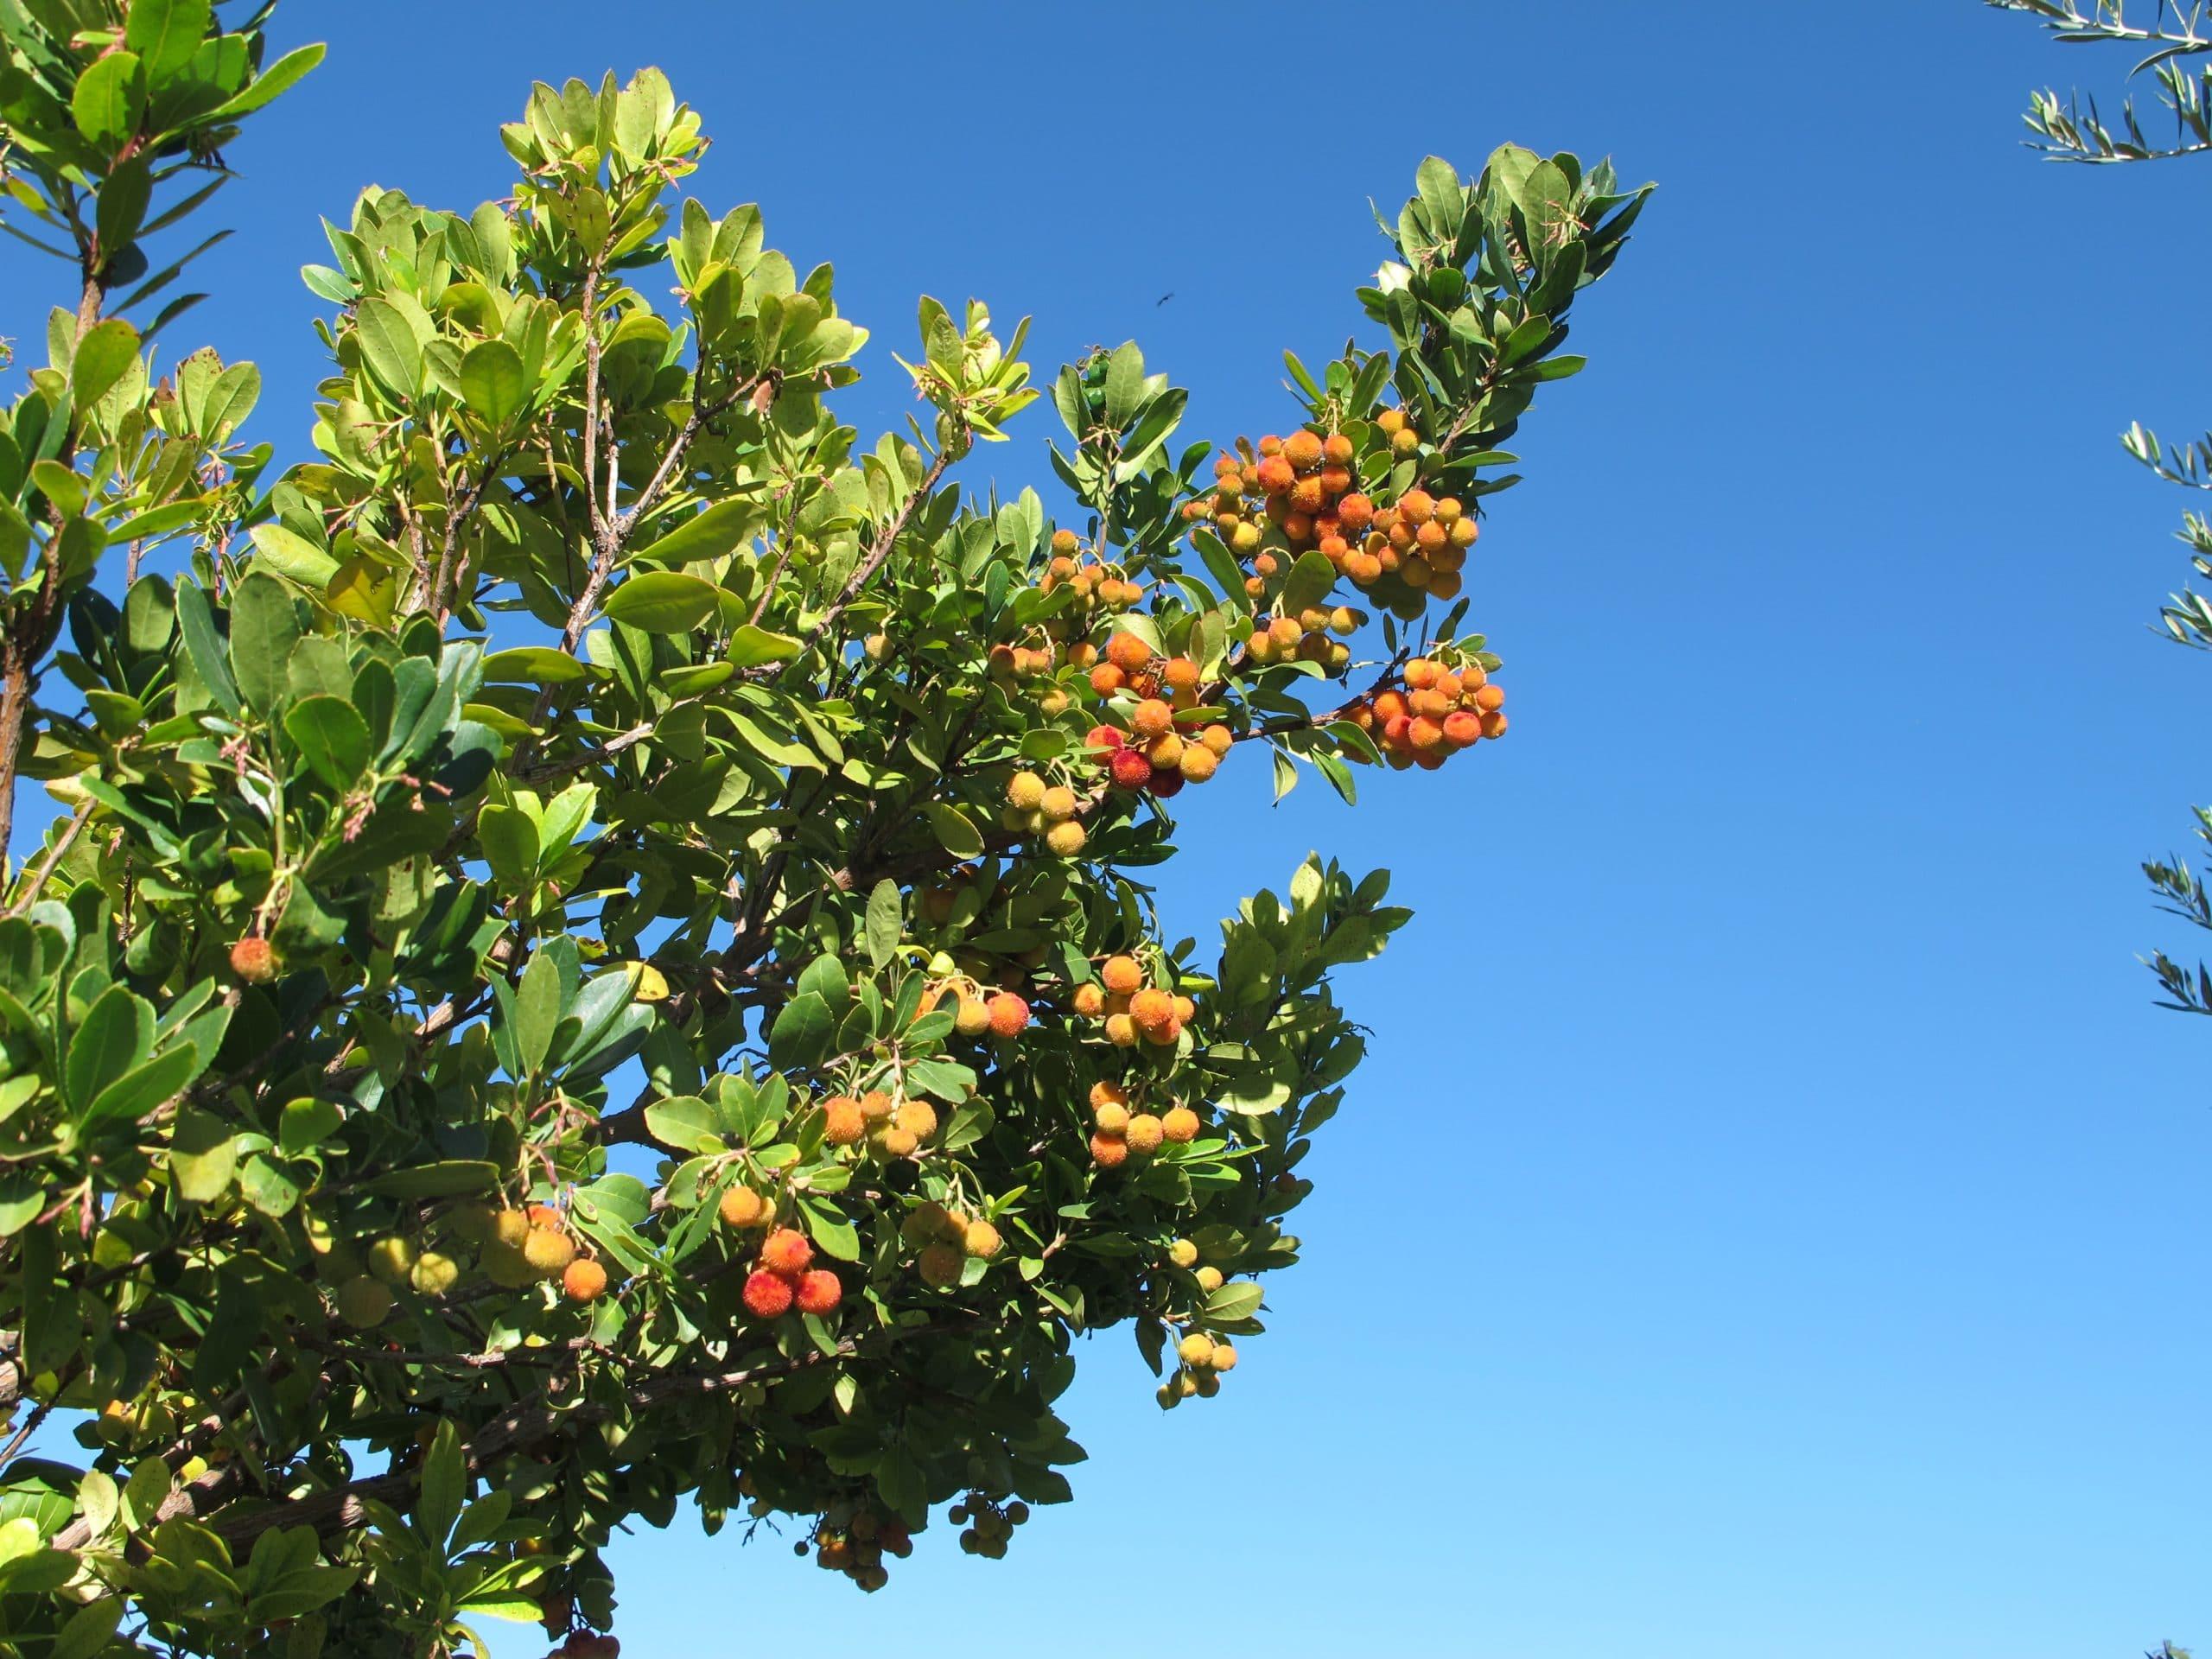 fruit laden branch